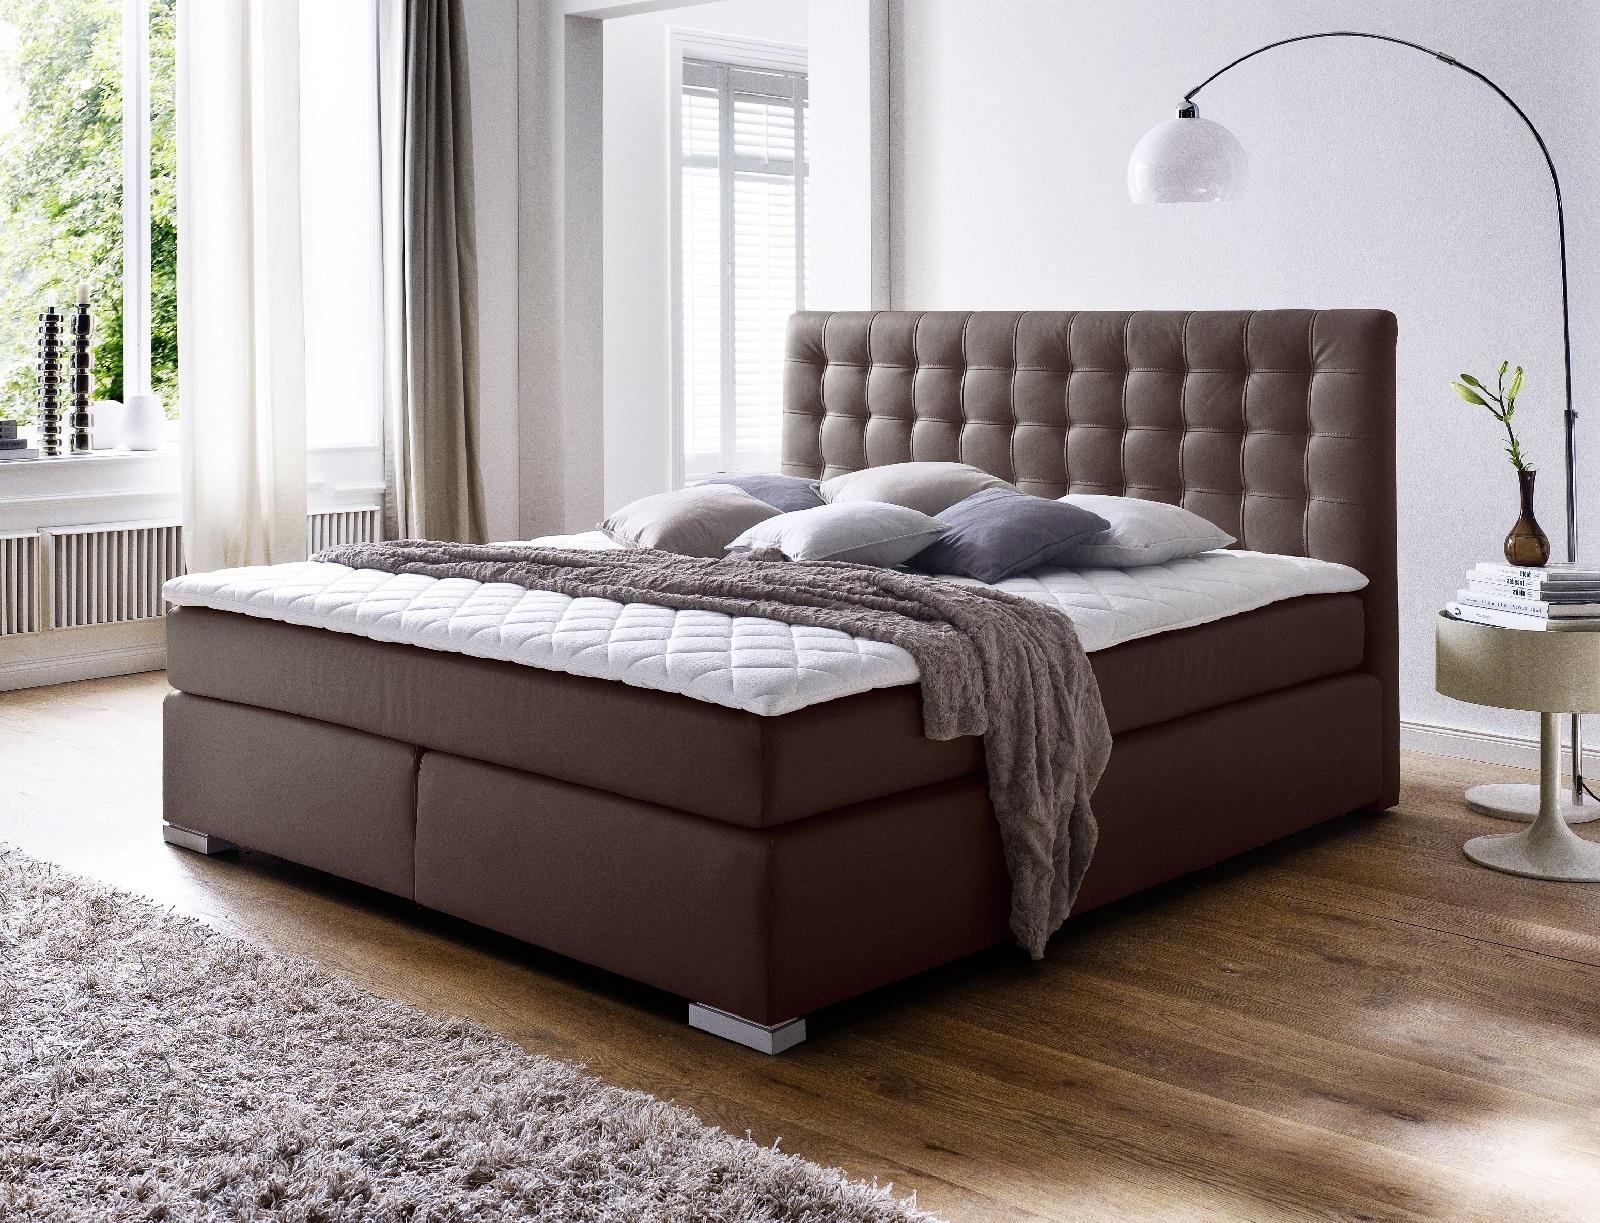 boxspringbett isabelle braun 180cm x 200cm. Black Bedroom Furniture Sets. Home Design Ideas